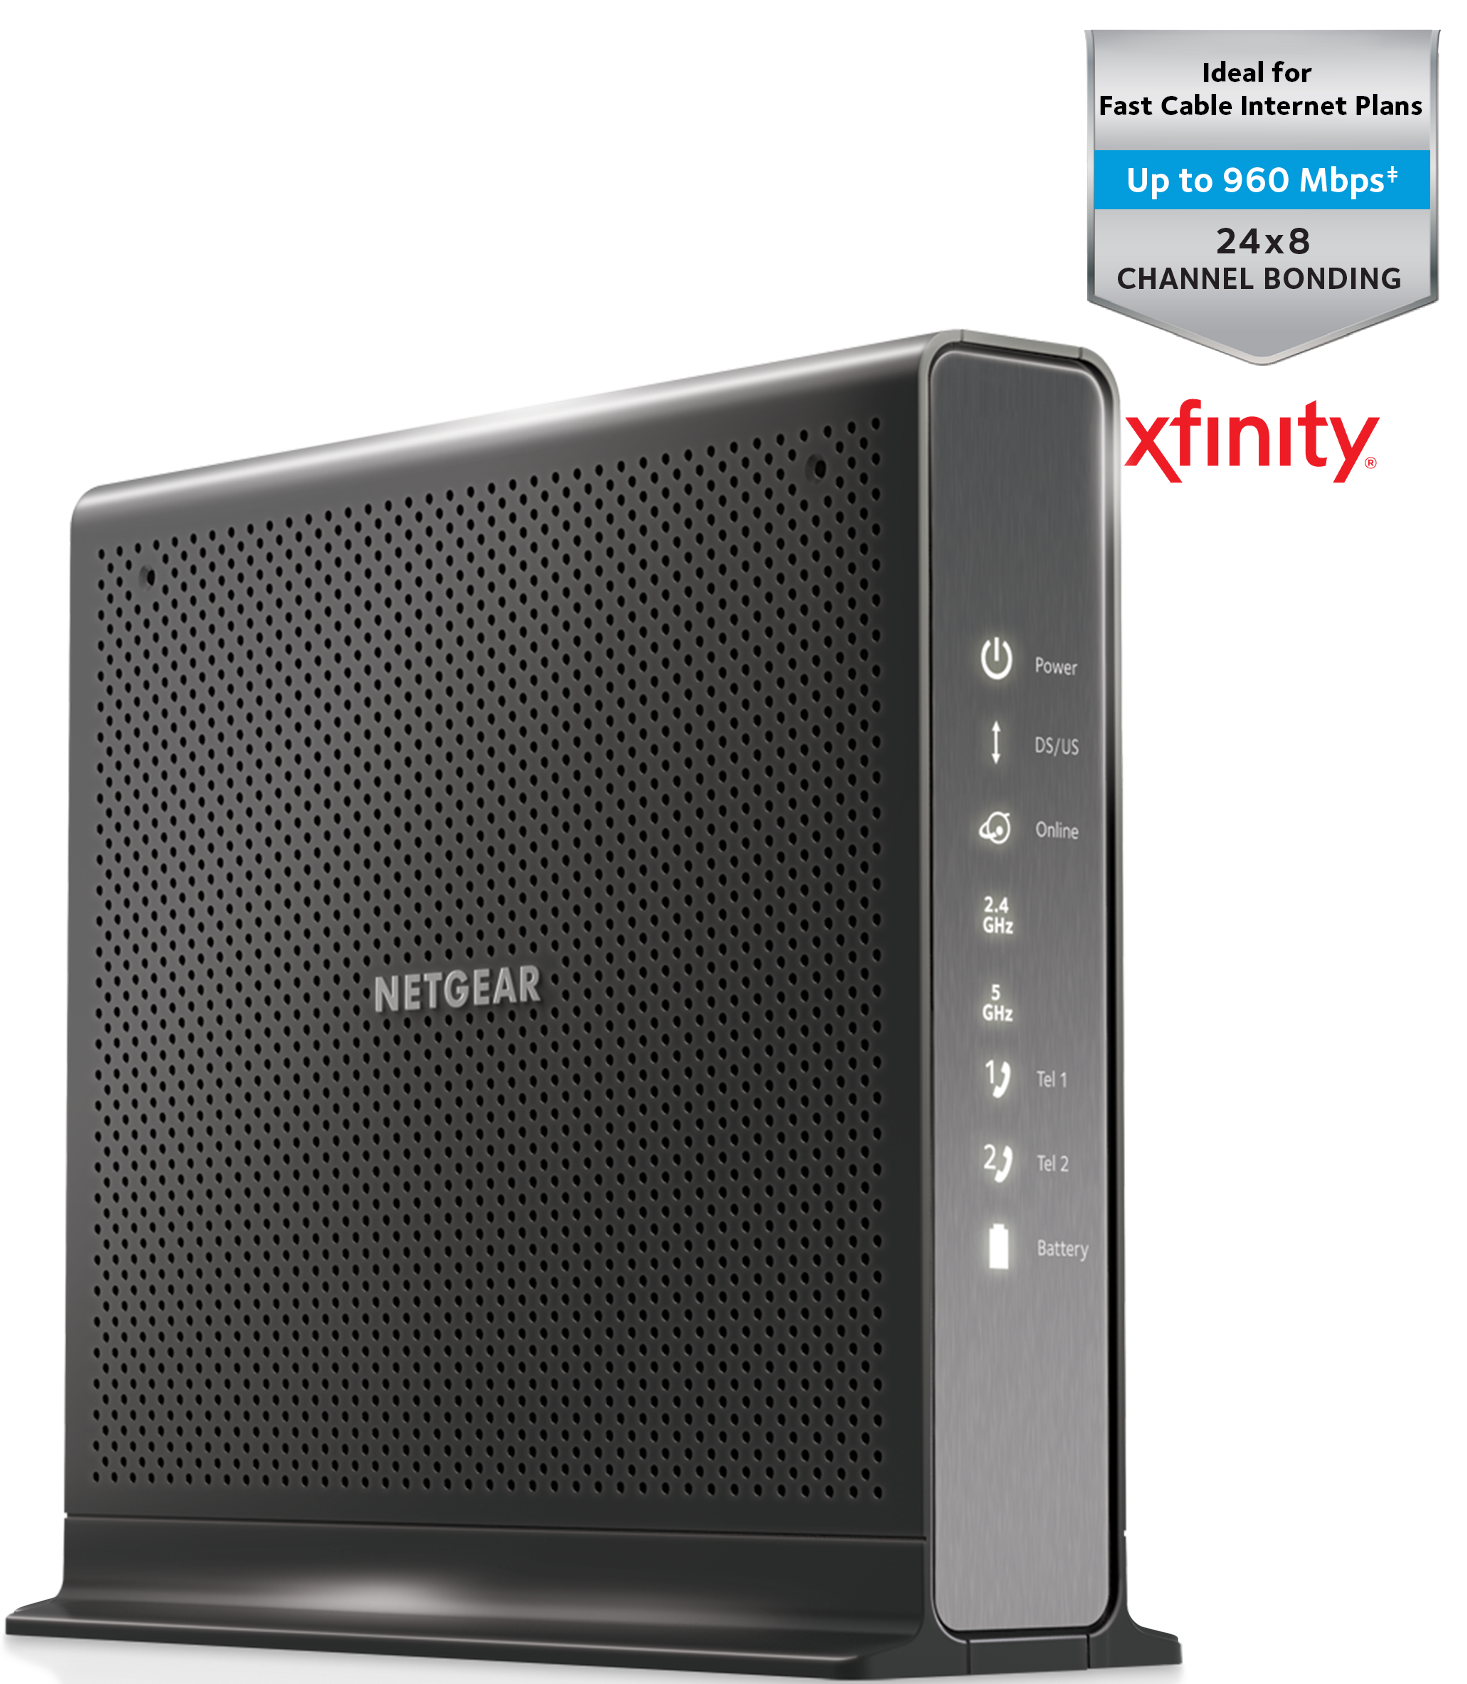 Amazon.com: NETGEAR Nighthawk AC1900 (24x8) DOCSIS 3.0 ...